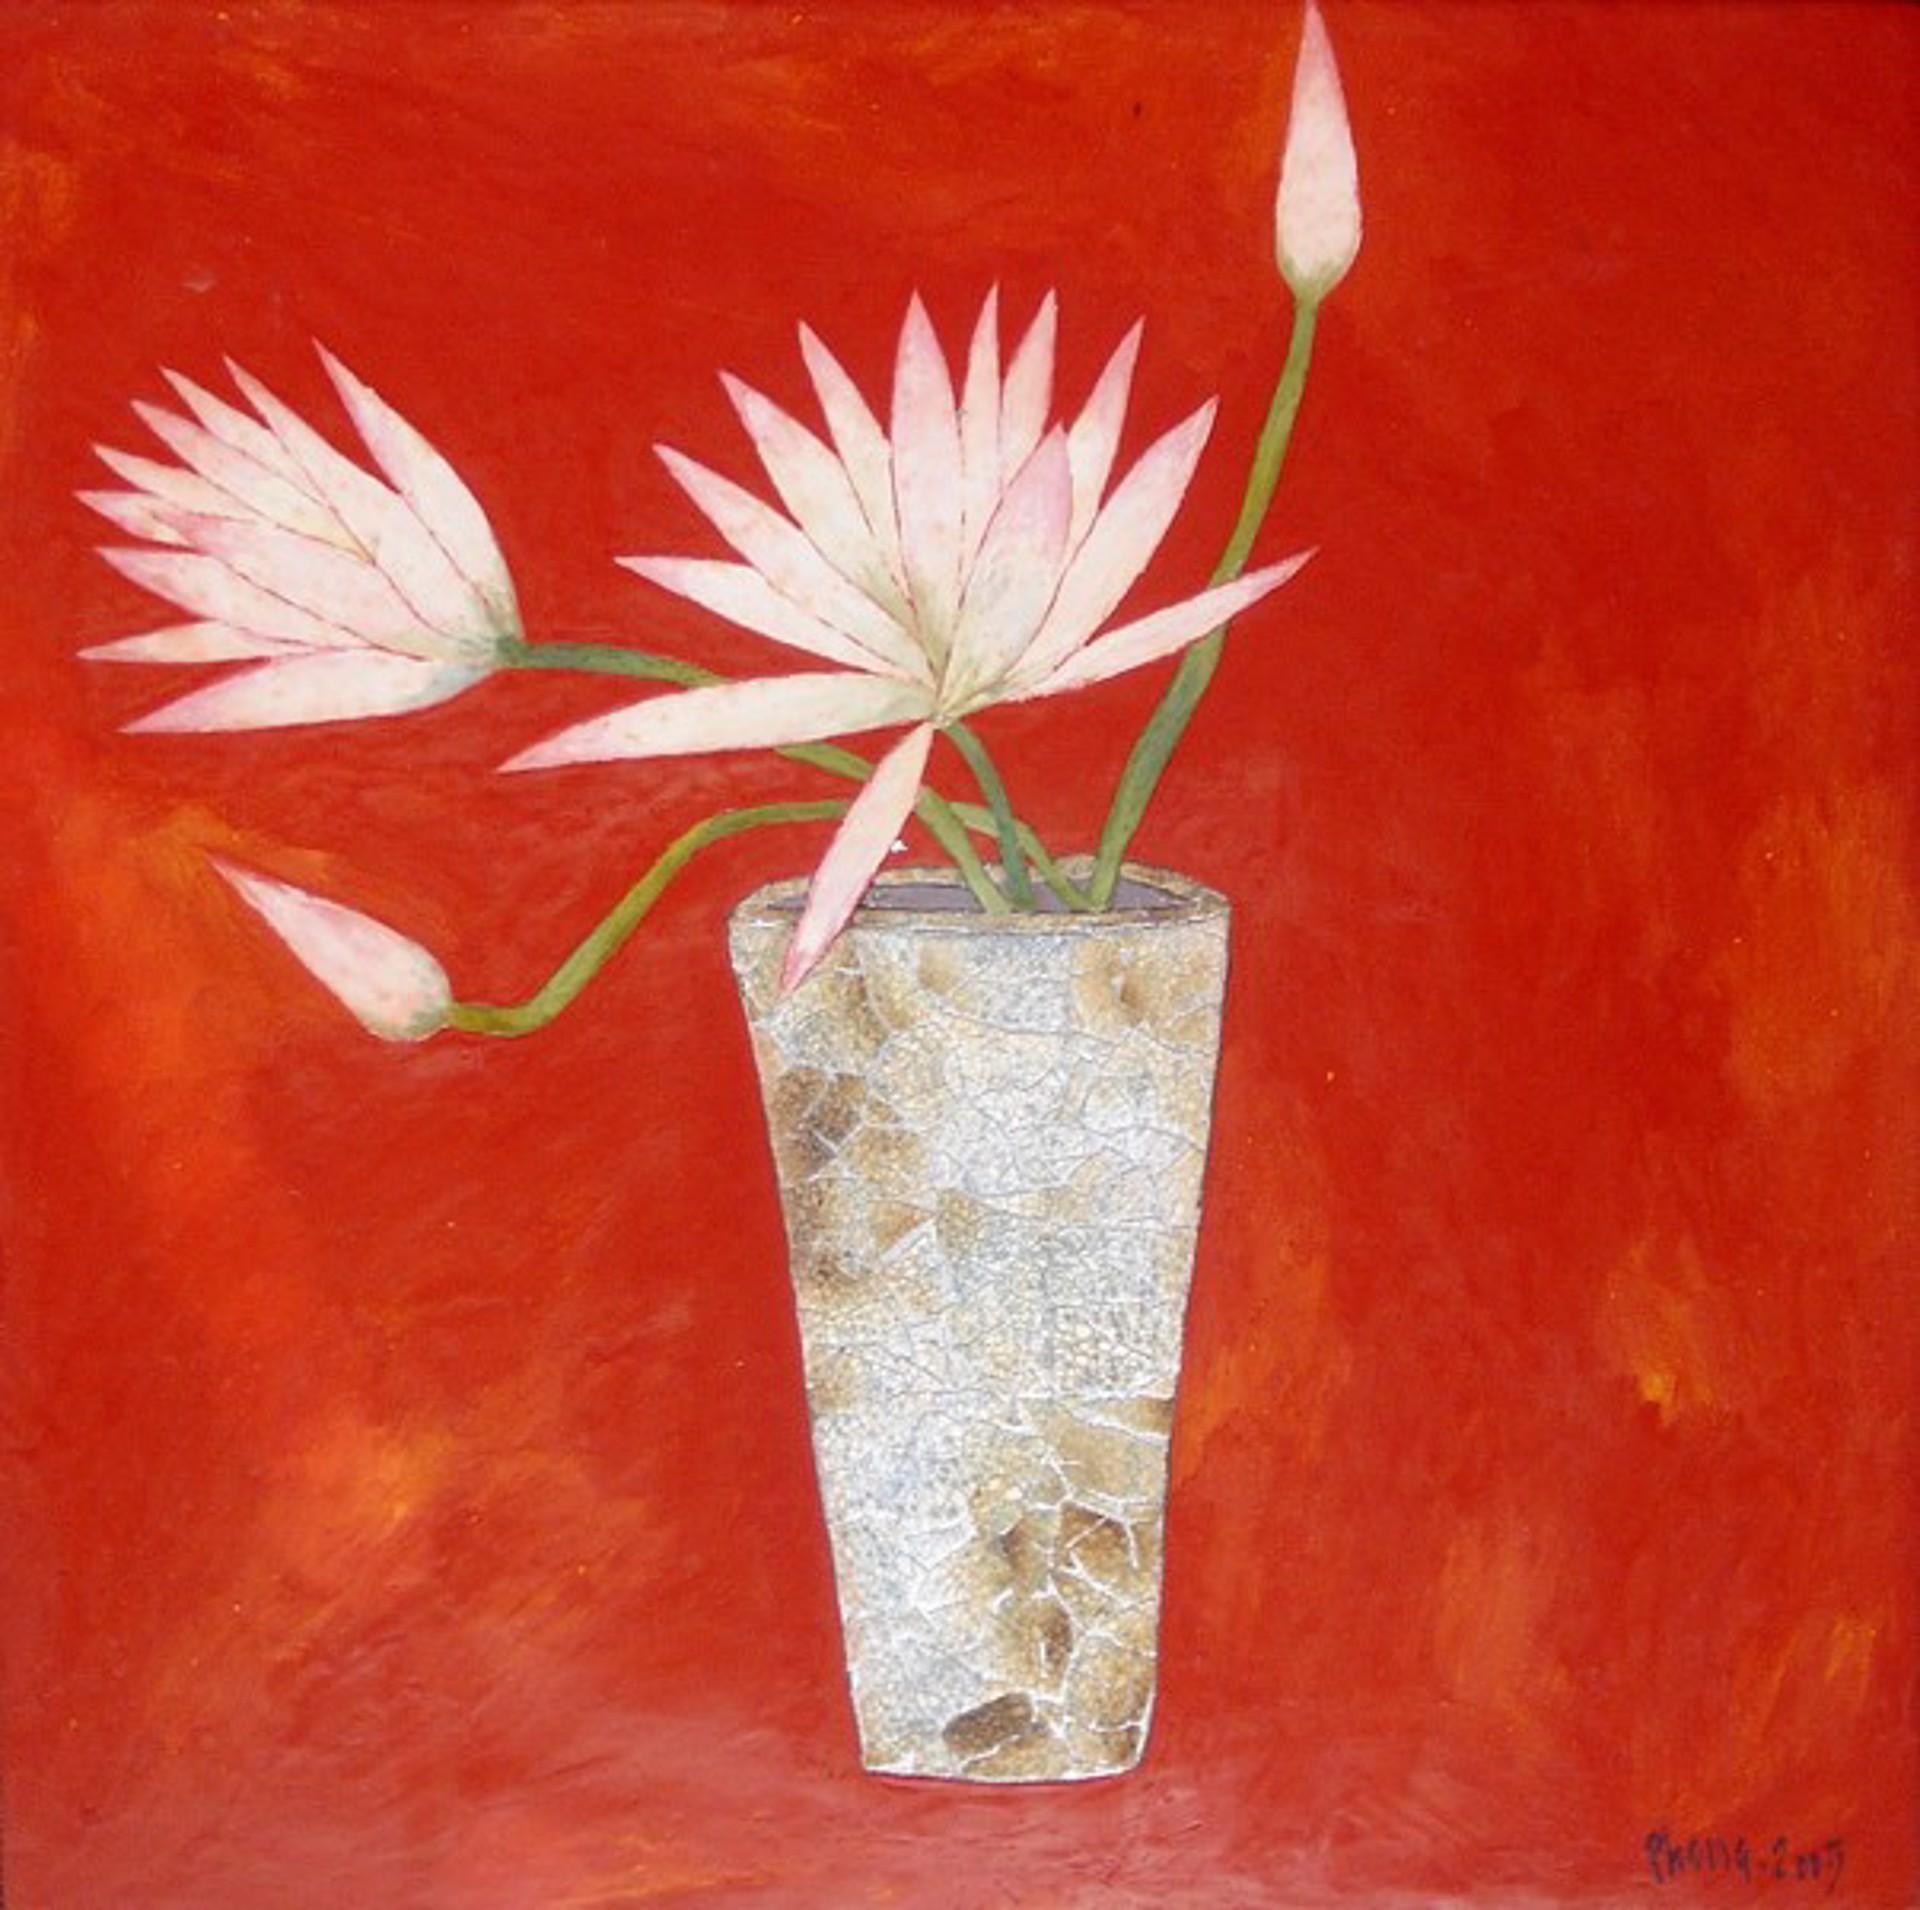 Lotus Bloom II by Hoang Thanh Vinh Phong